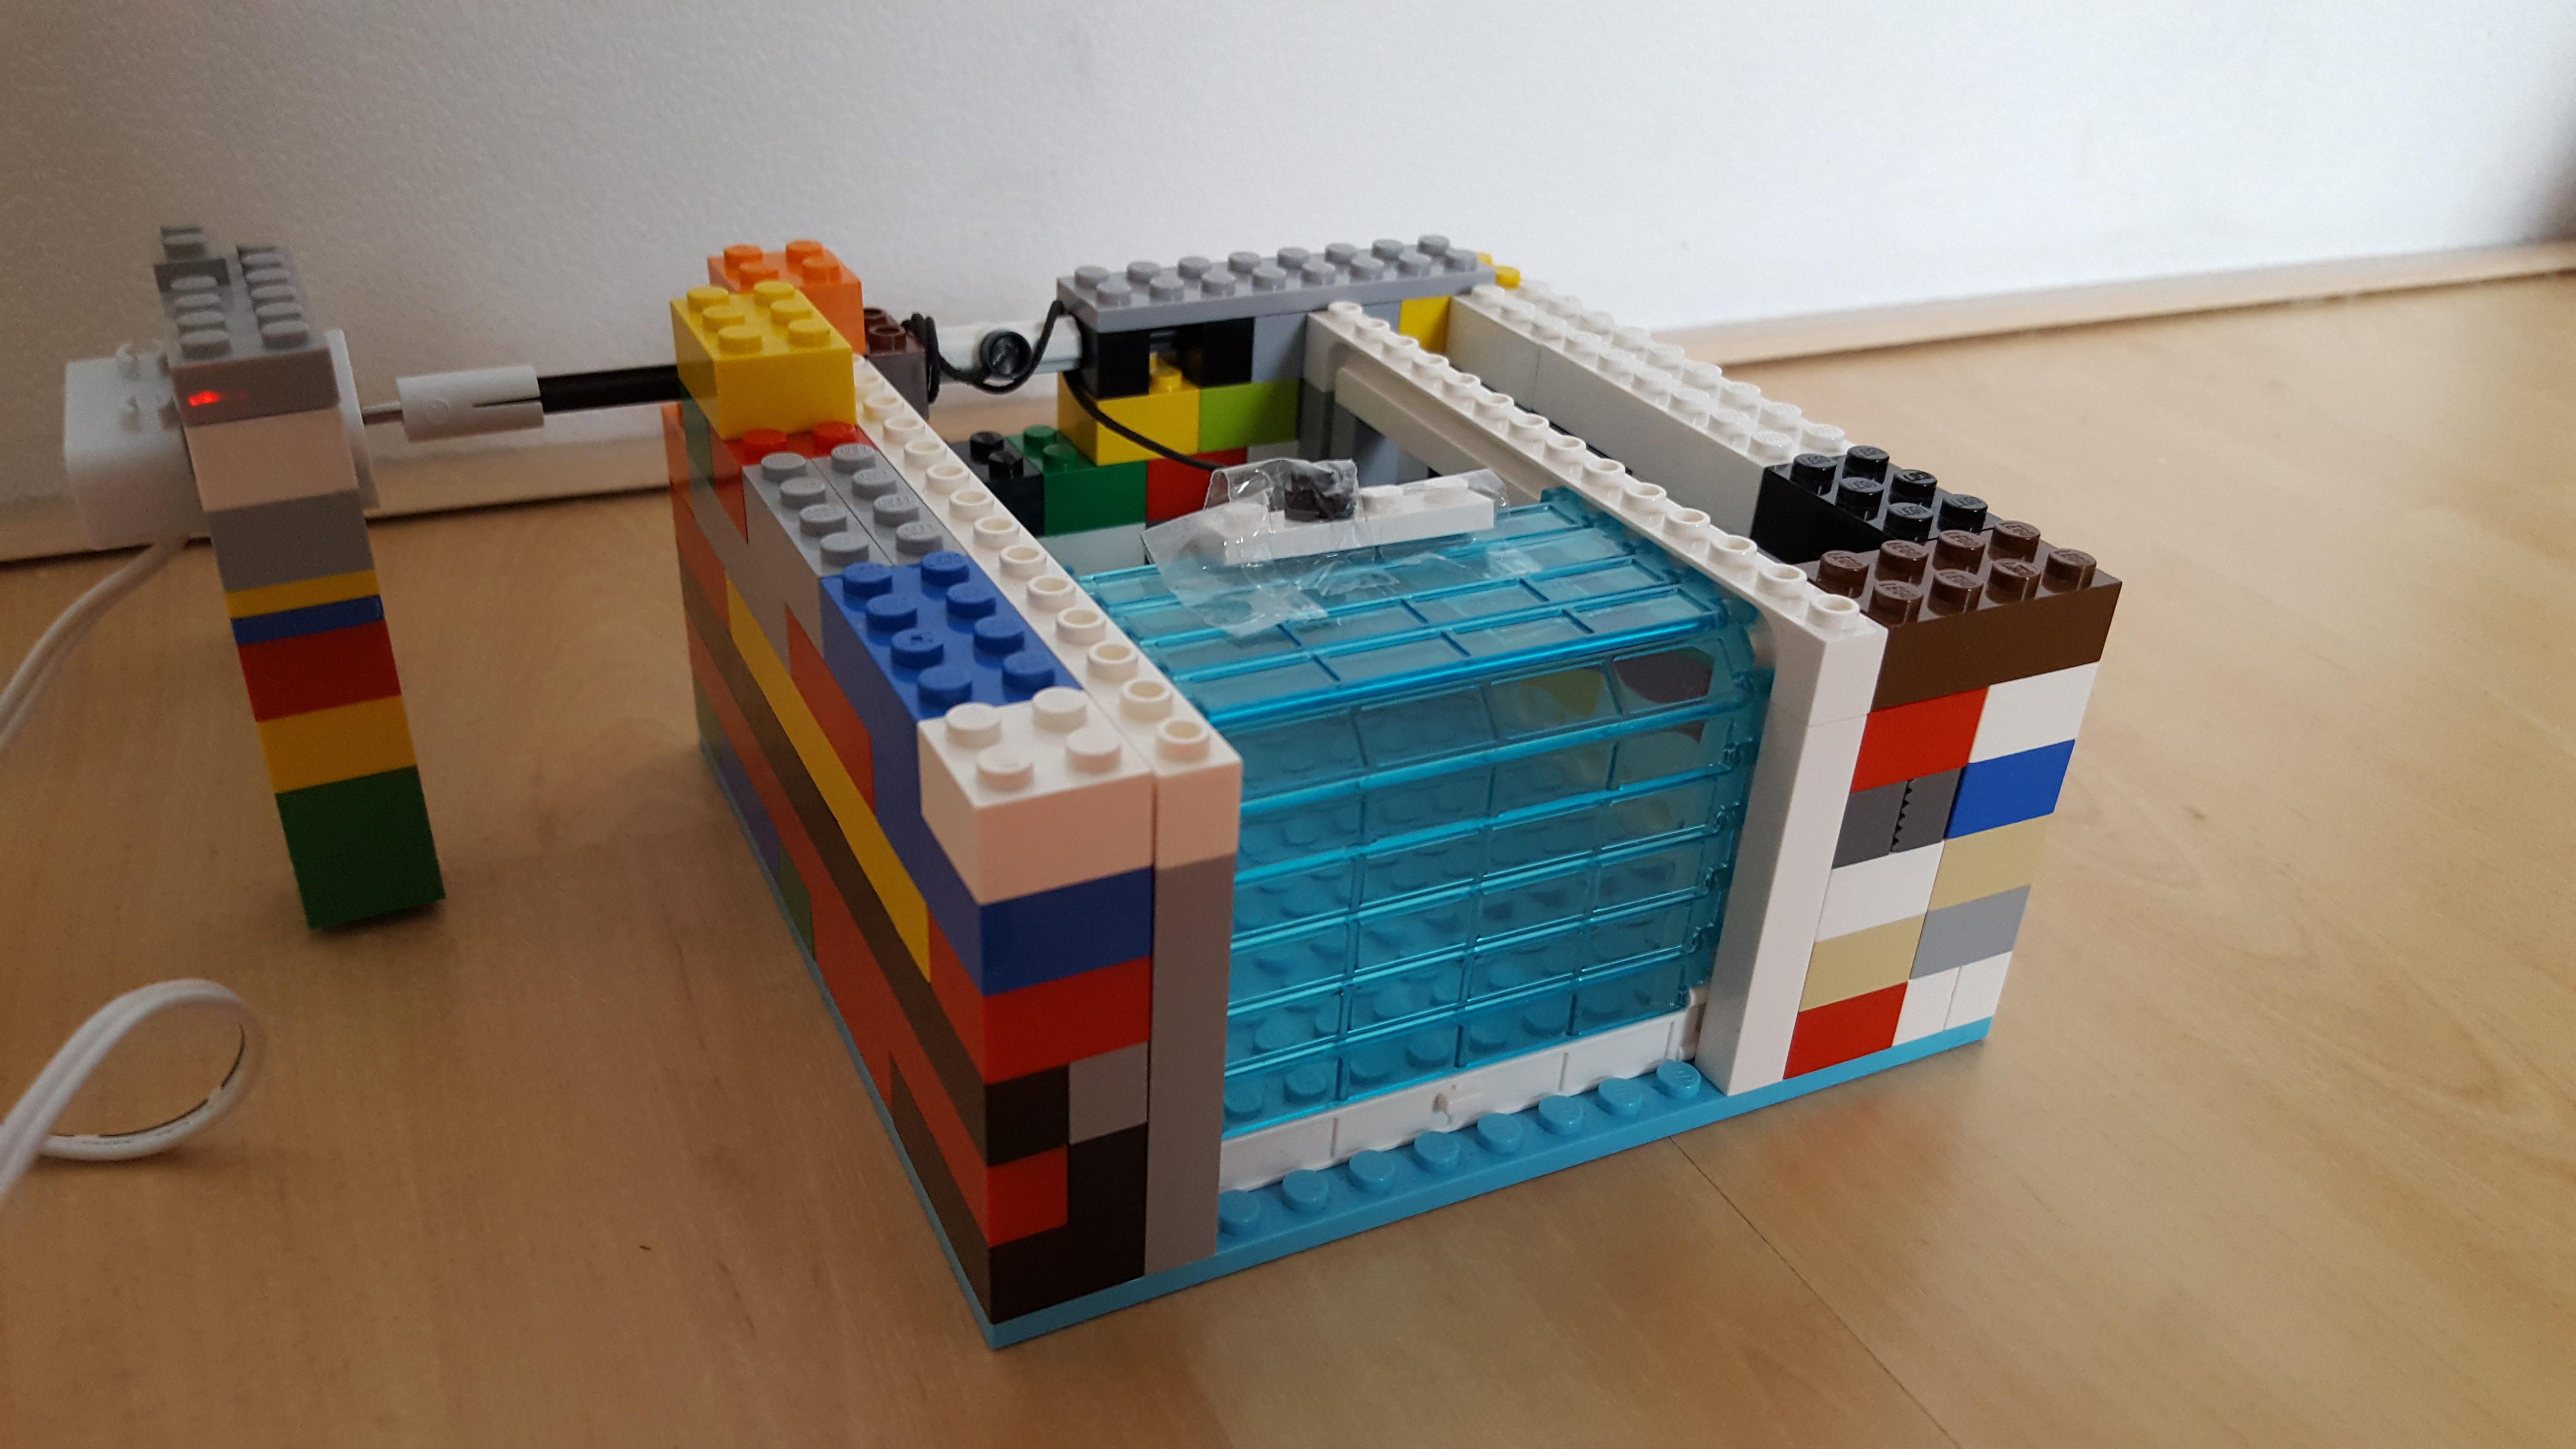 D9ce5a78 2767 49ef bc20 03aee7791048  sc 1 st  littleBits & Automatic Lego garage door: a littleBits Project by joeri